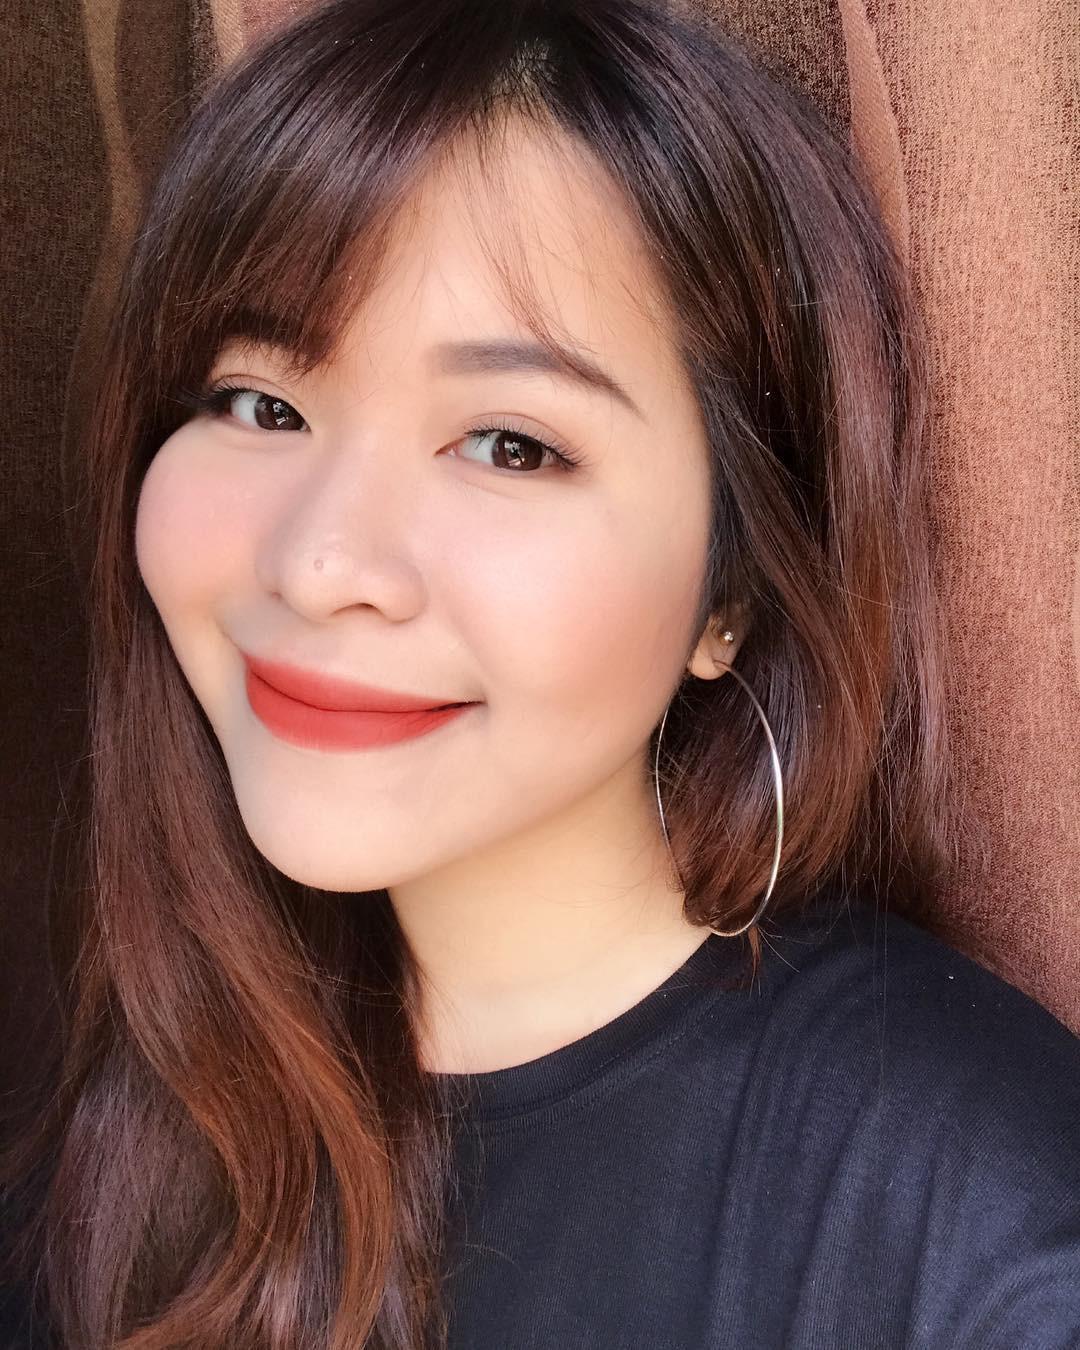 Beauty Blogger An Phương